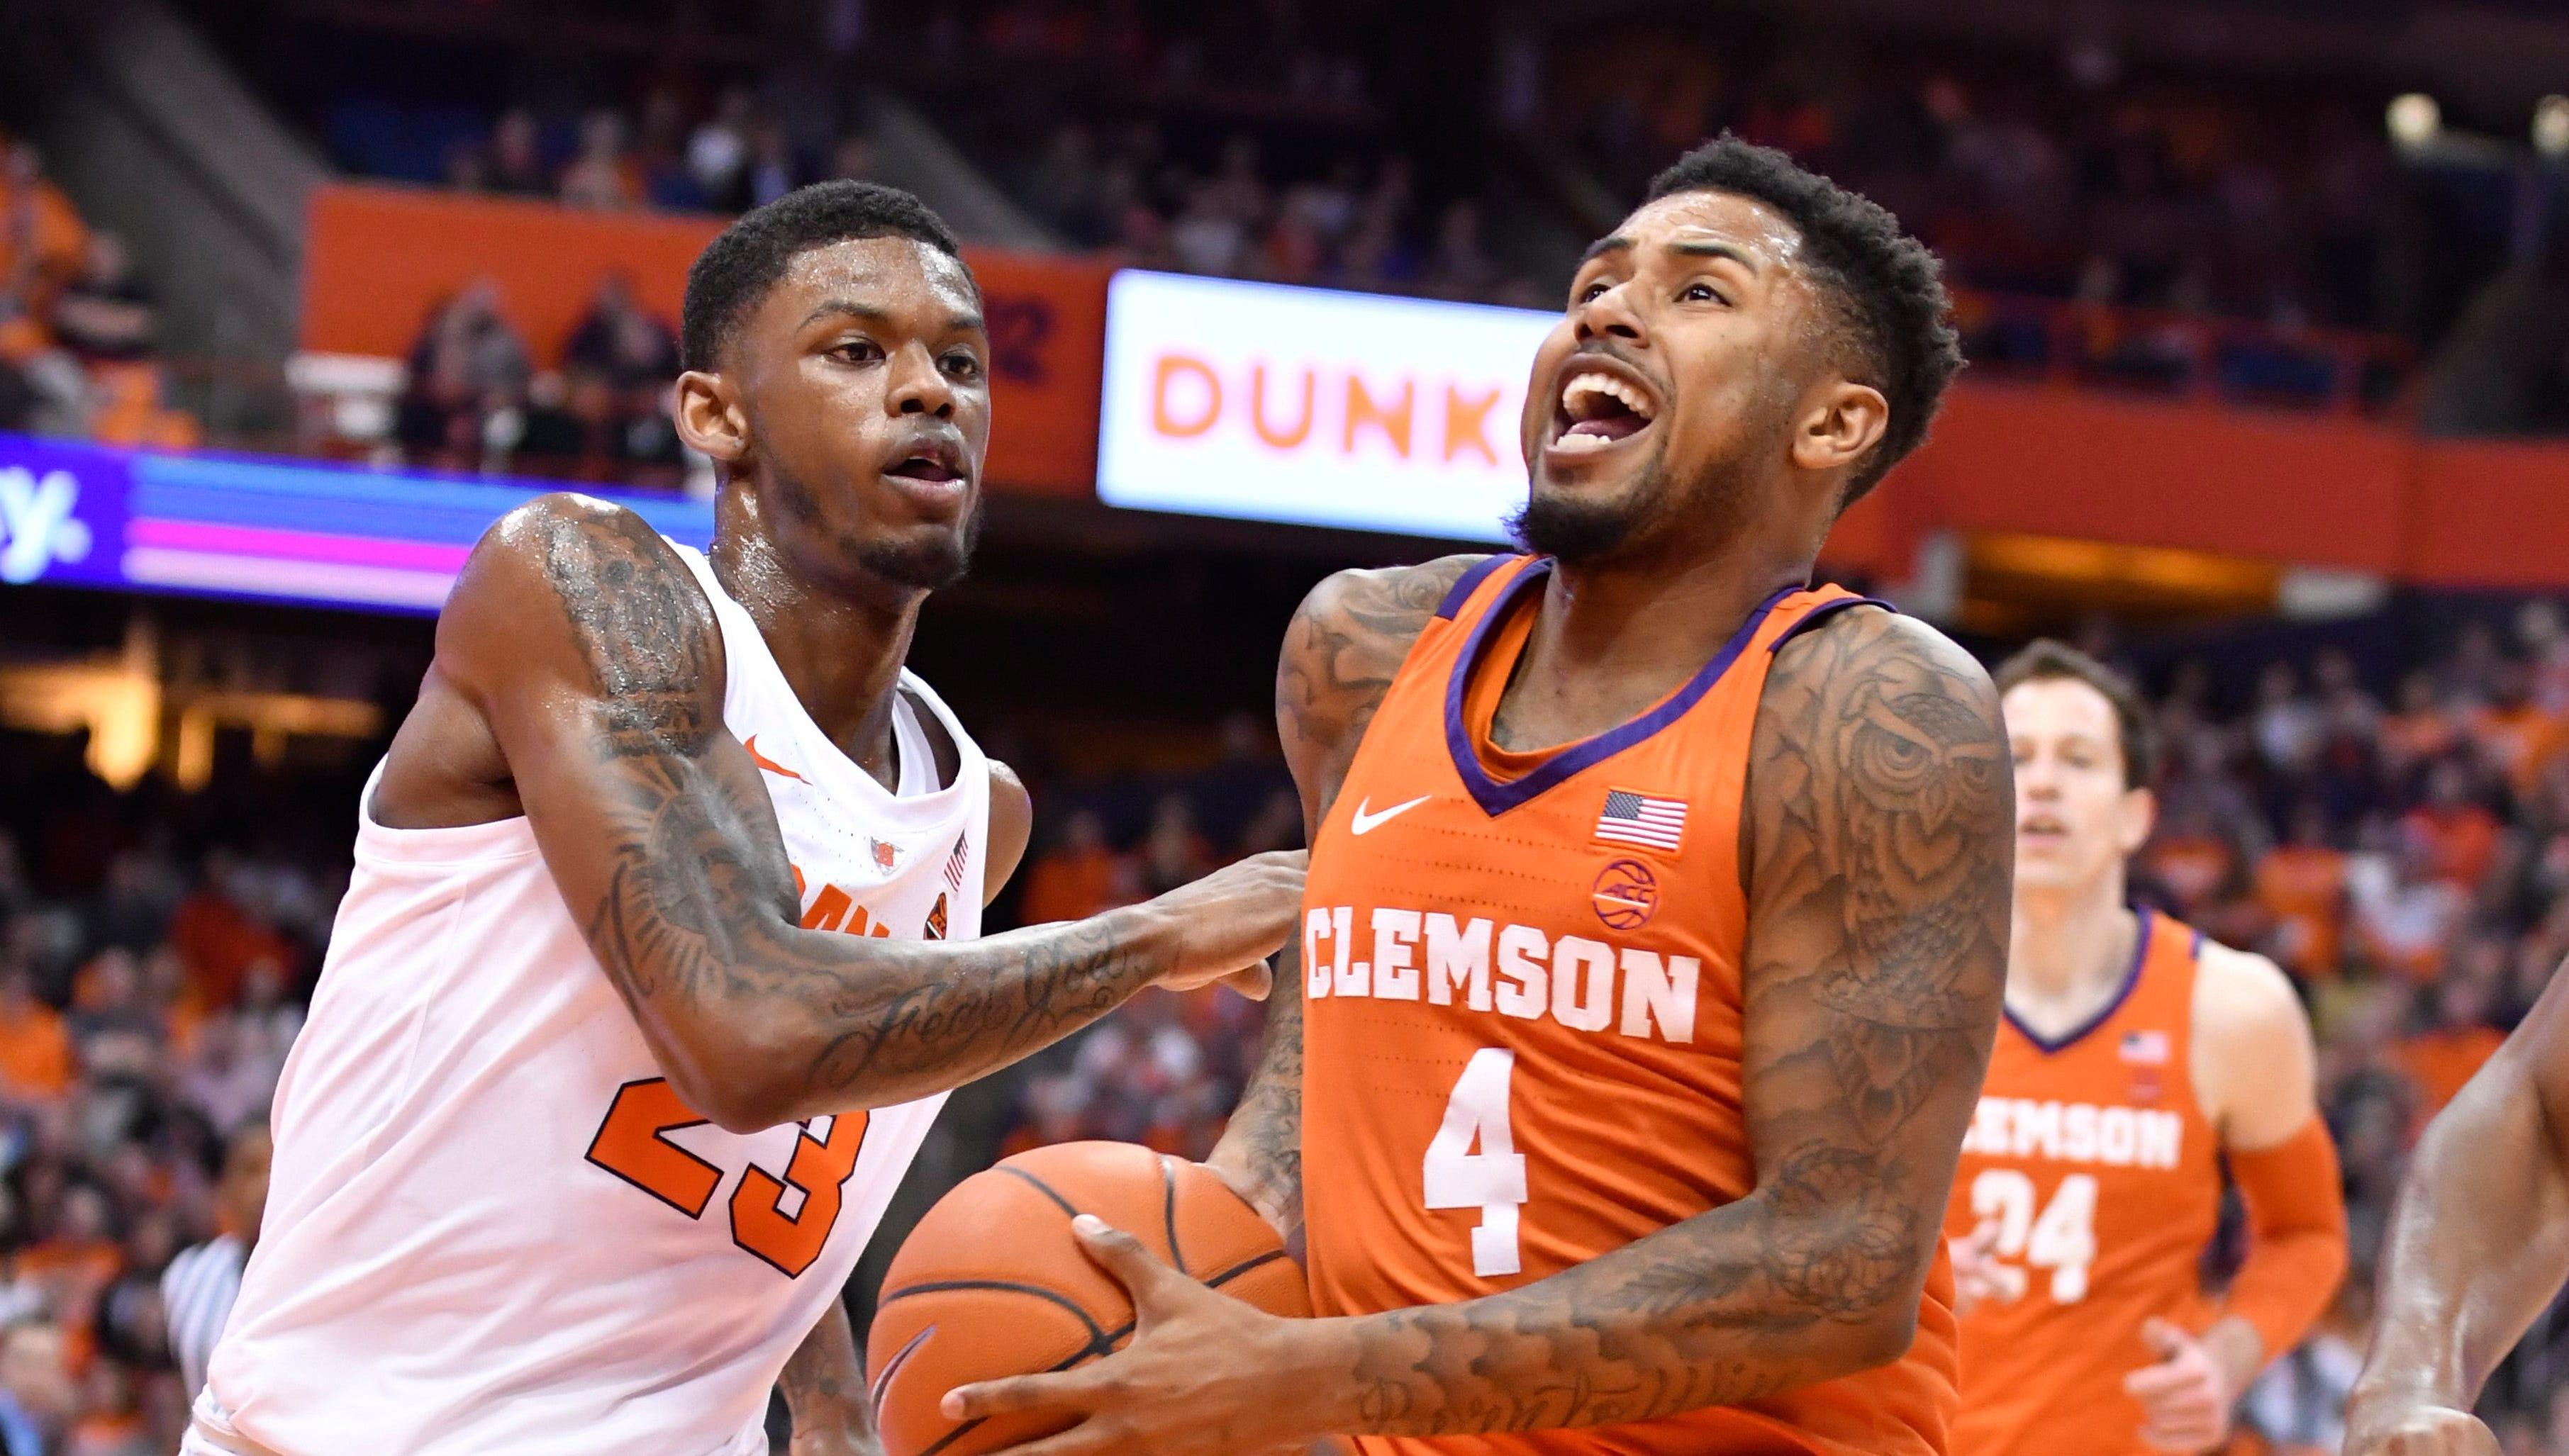 Syracuse Basketball Uses Press To Take Down Clemson